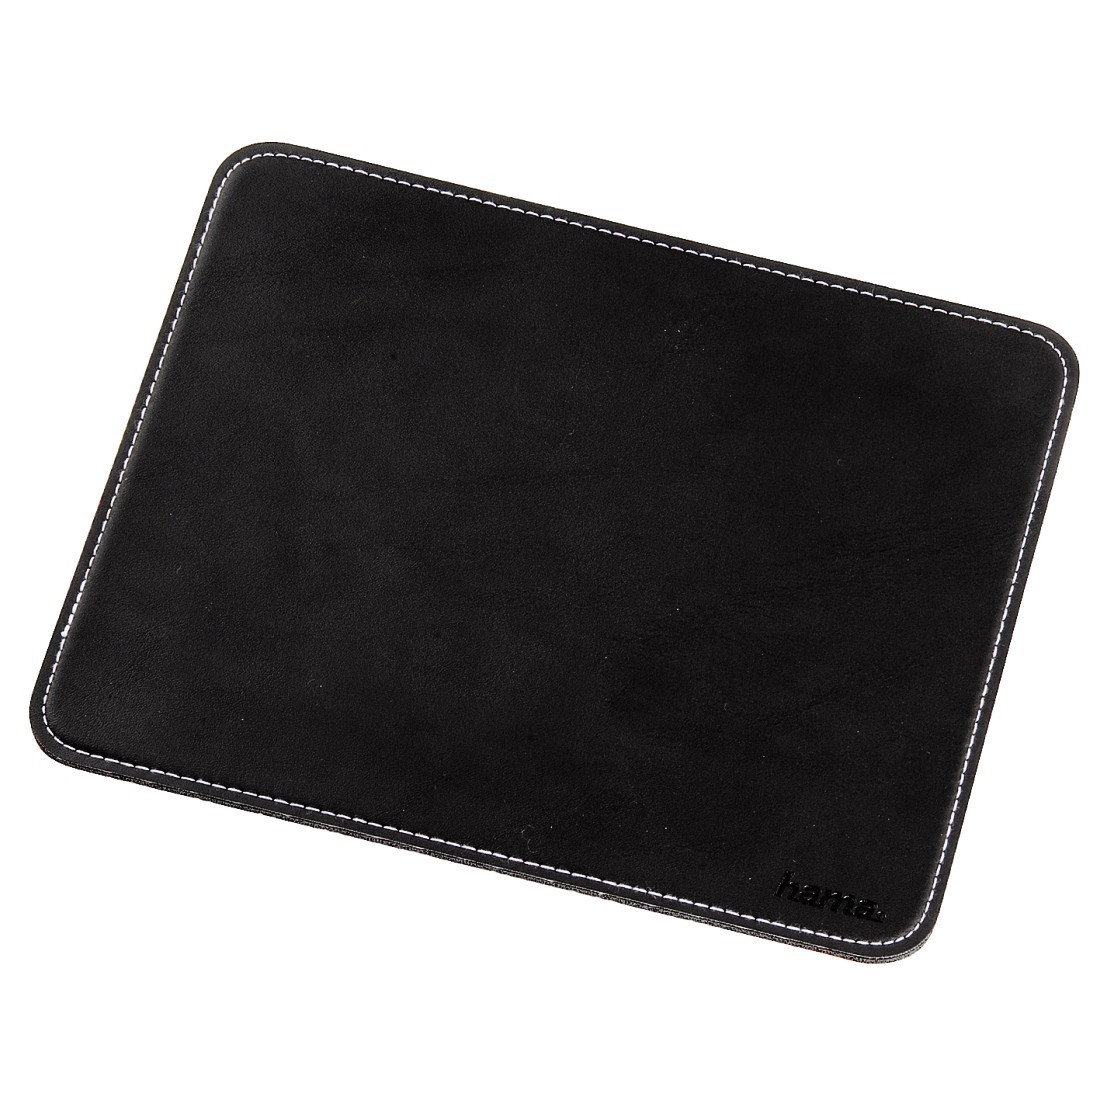 podkladka-pod-mysz-with-leather-look-czarna